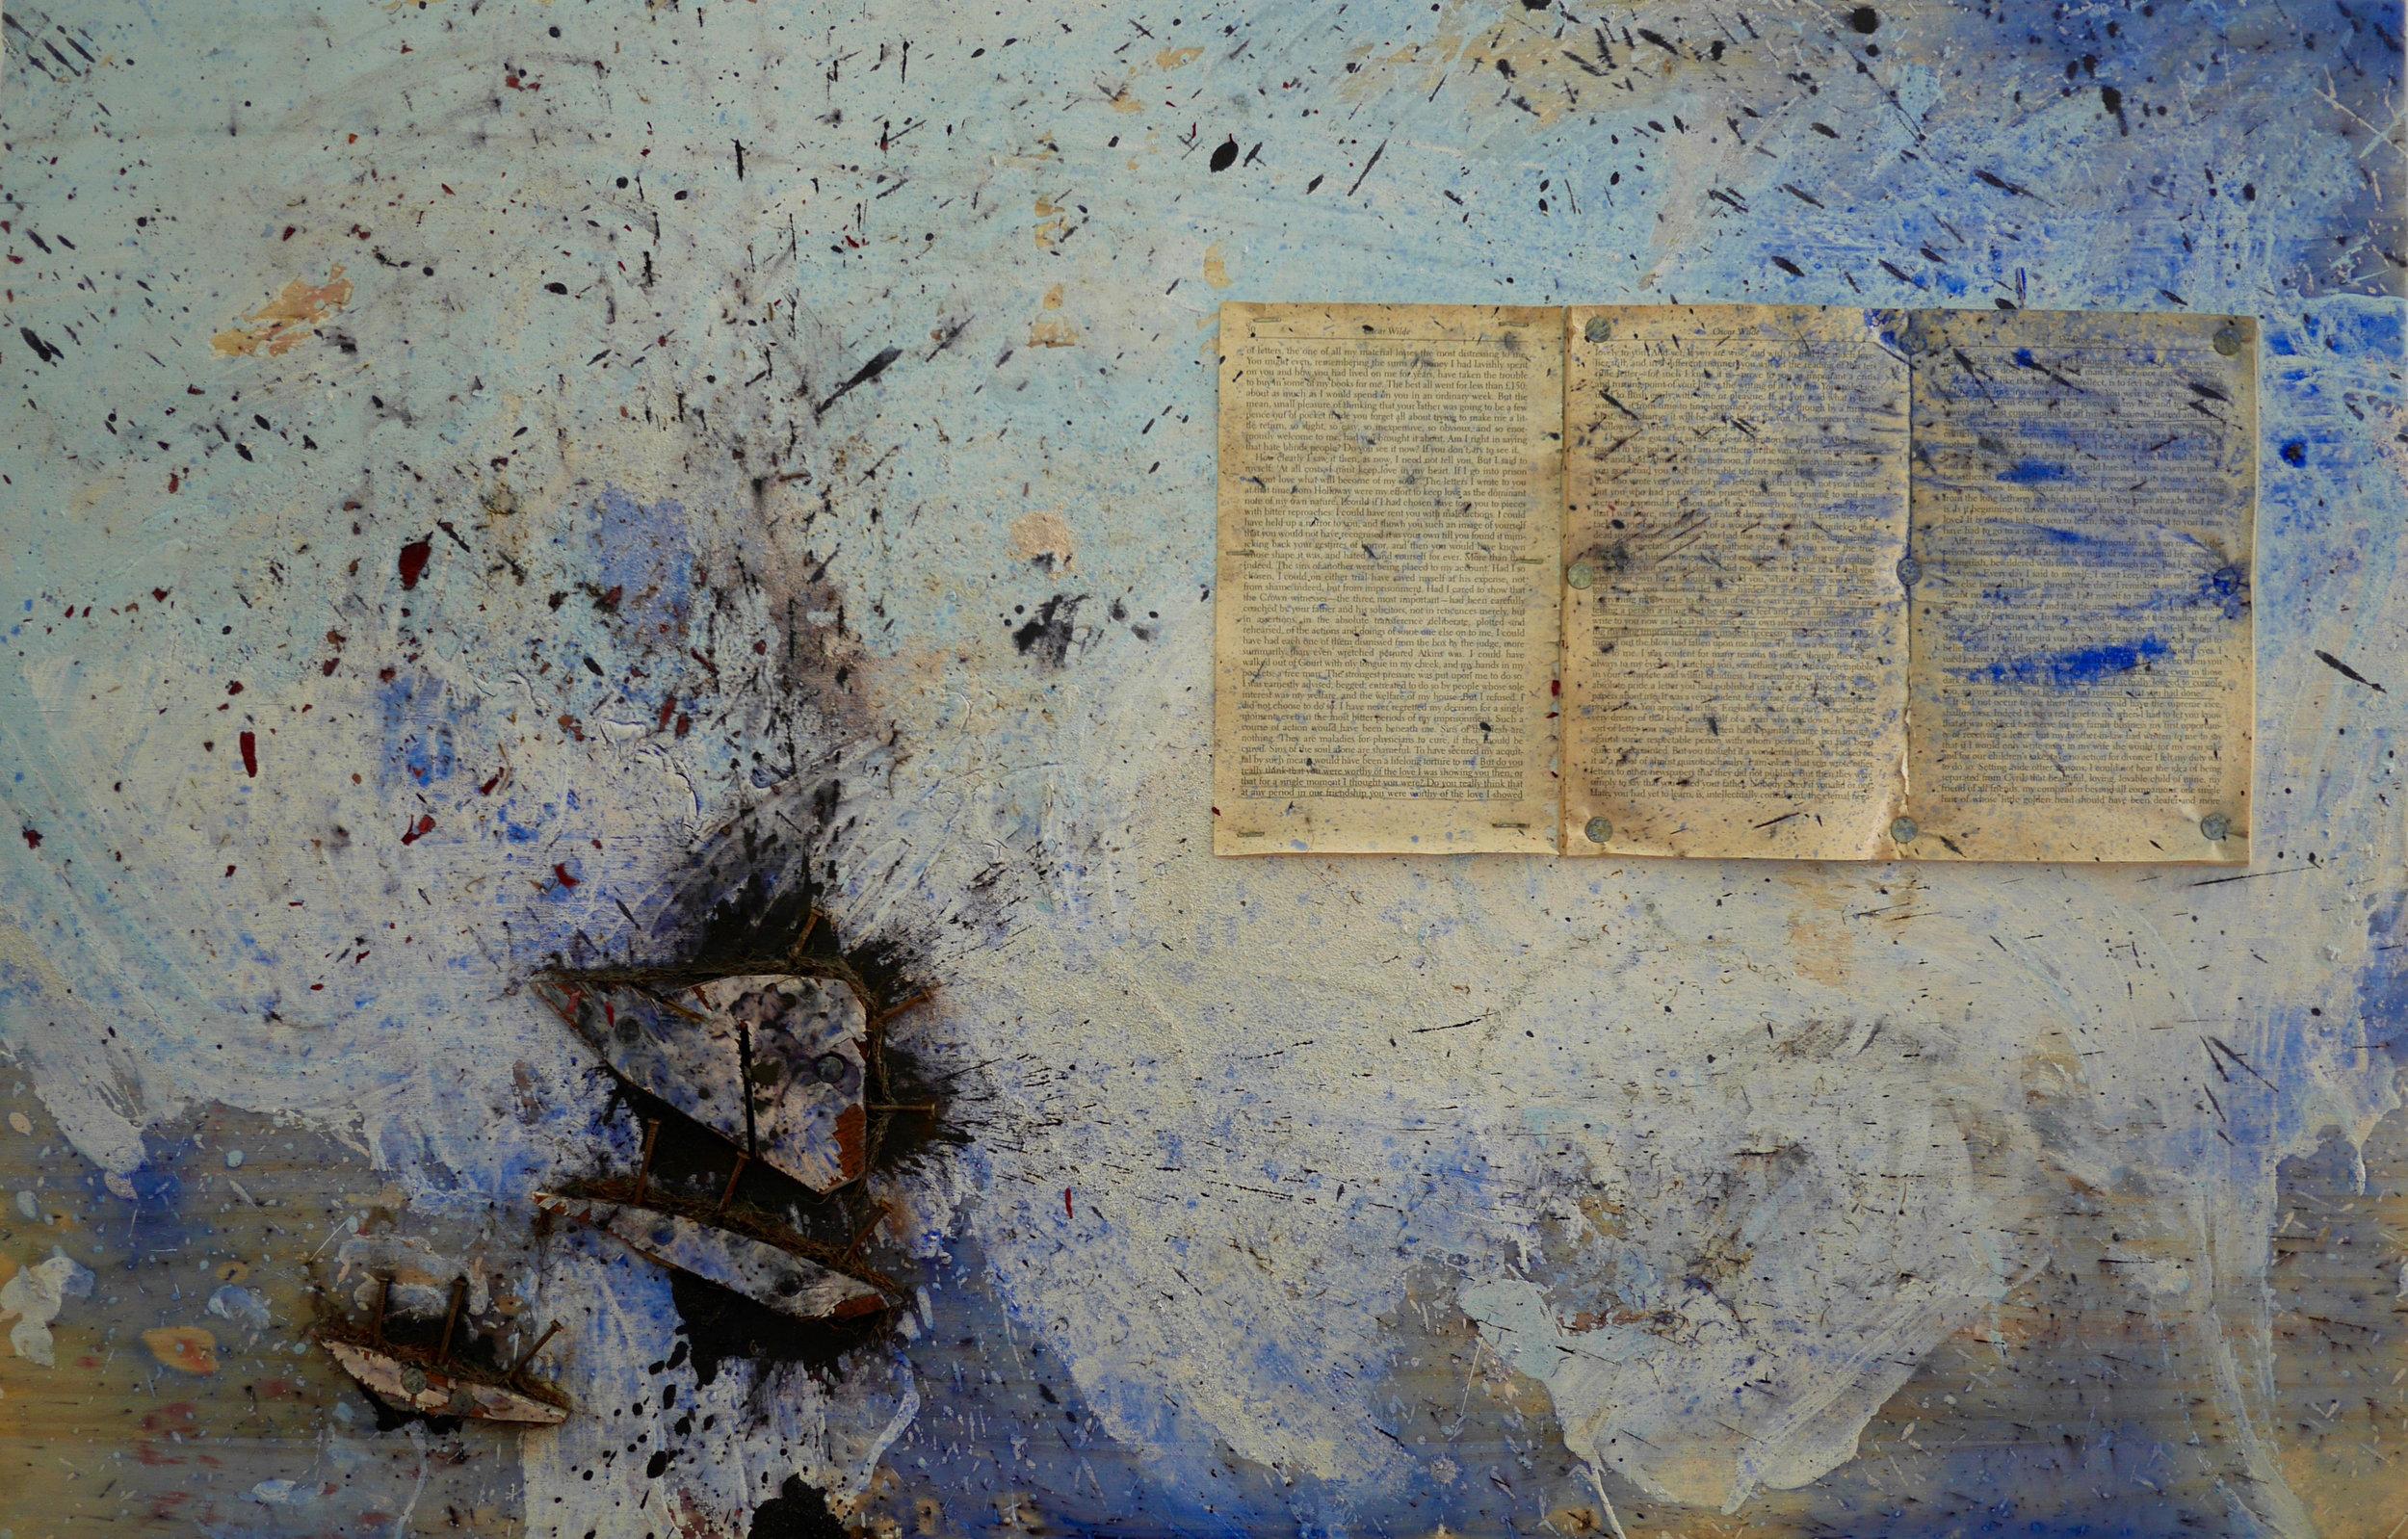 "Number 6 - Your Own Silence  24"" x 32""  ""De Profundis"", nails, wood, acrylic, milk, vinegar, salt, ink, white flour, steel wool, dye, steel wire, staples, rust, dirt, mold on wood  (2015)"